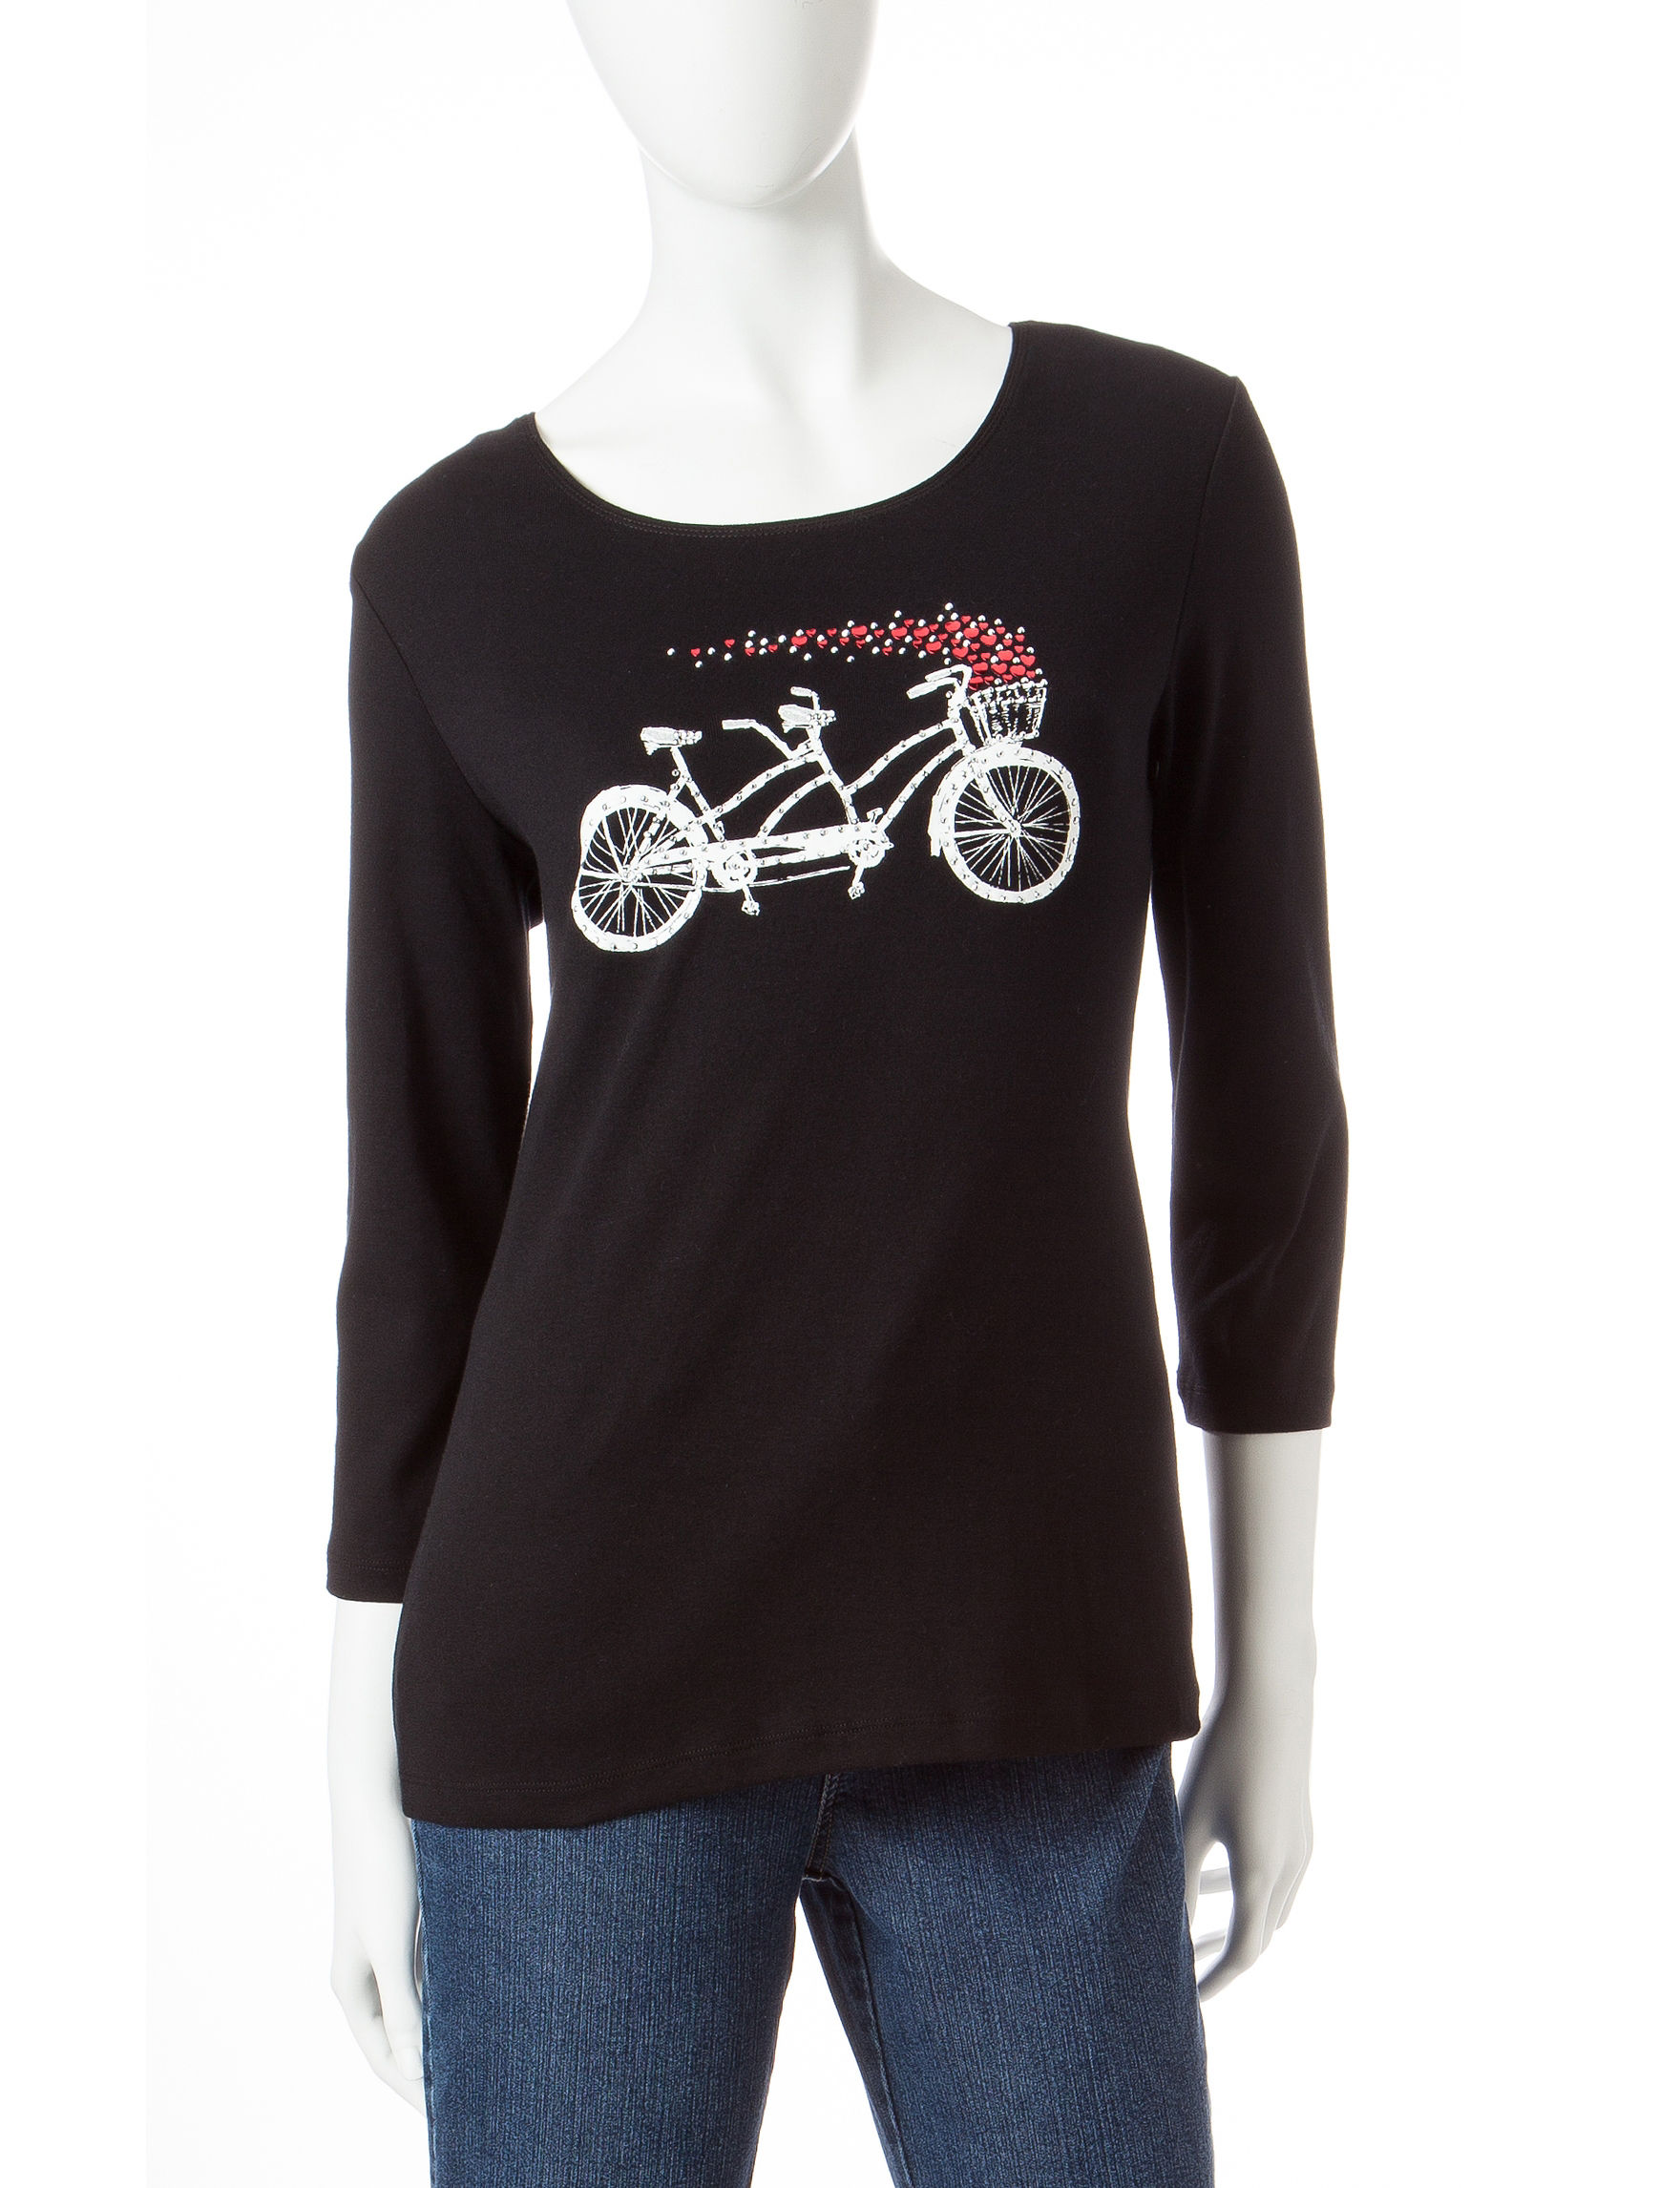 Rebecca Malone Black Pull-overs Shirts & Blouses